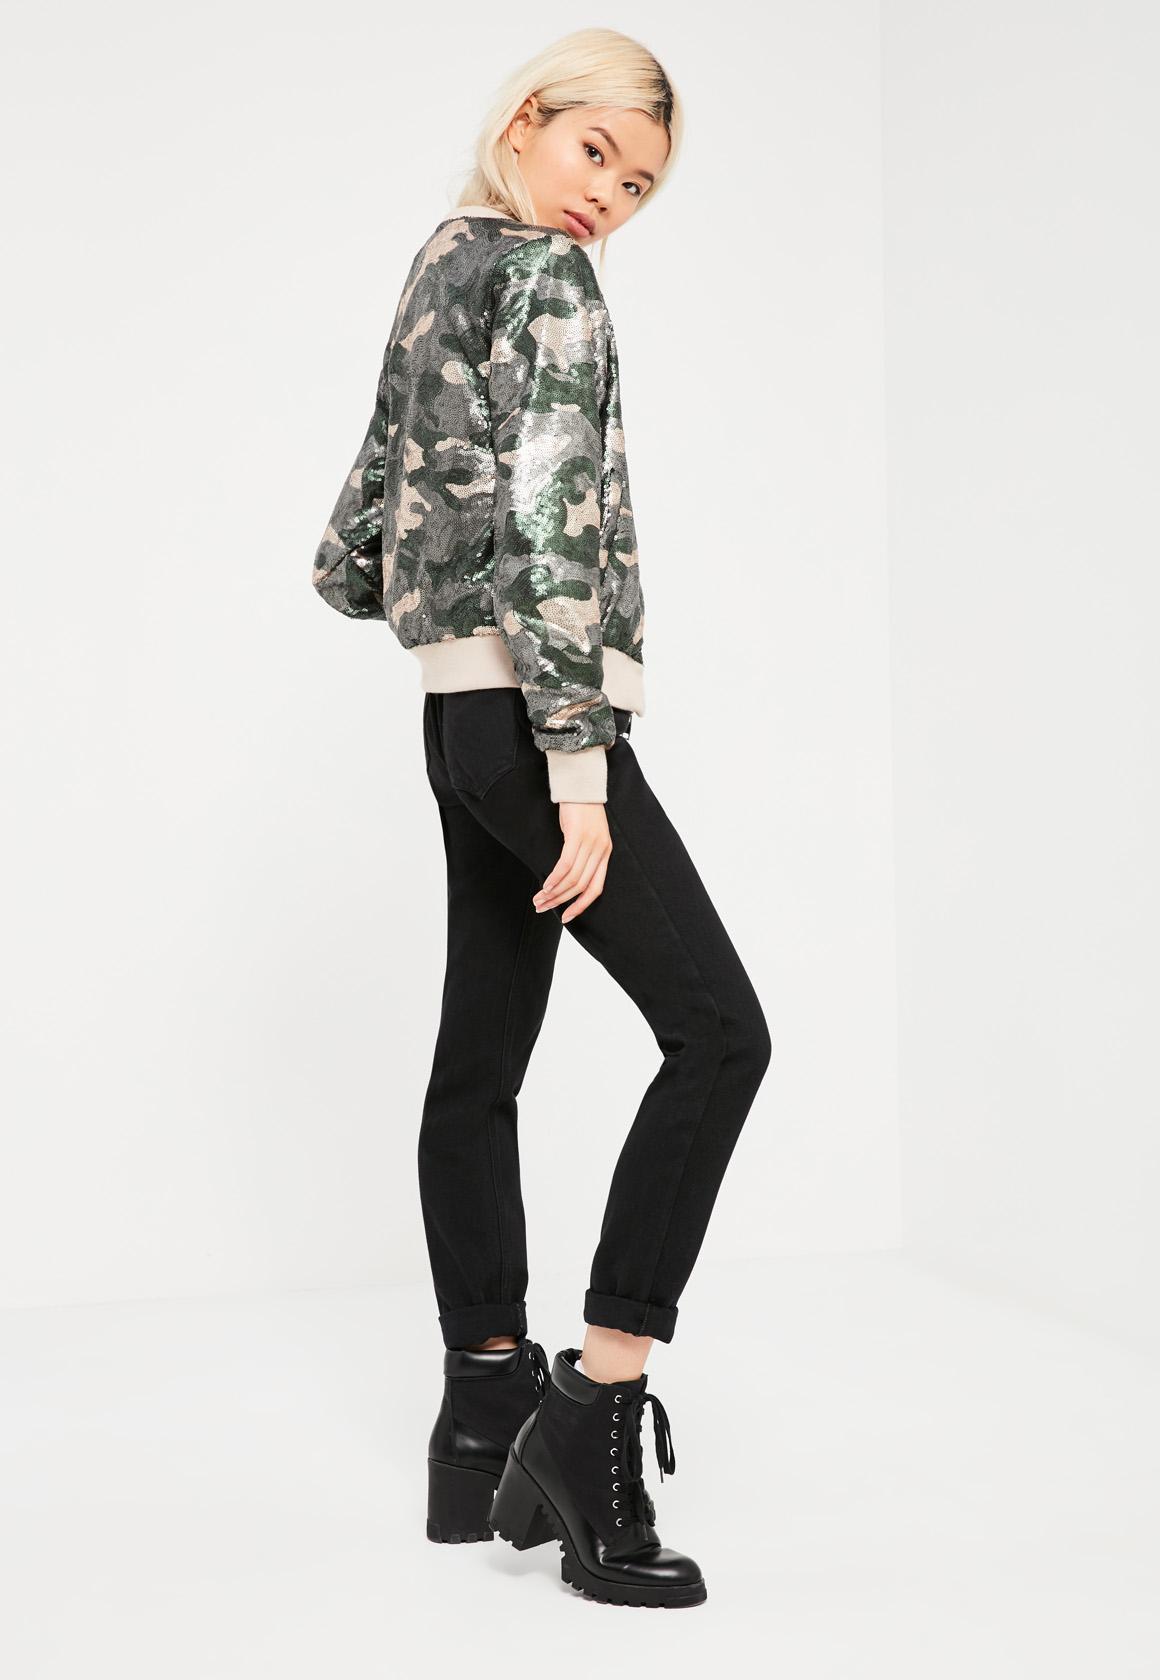 Khaki Camo Sequin Bomber Jacket